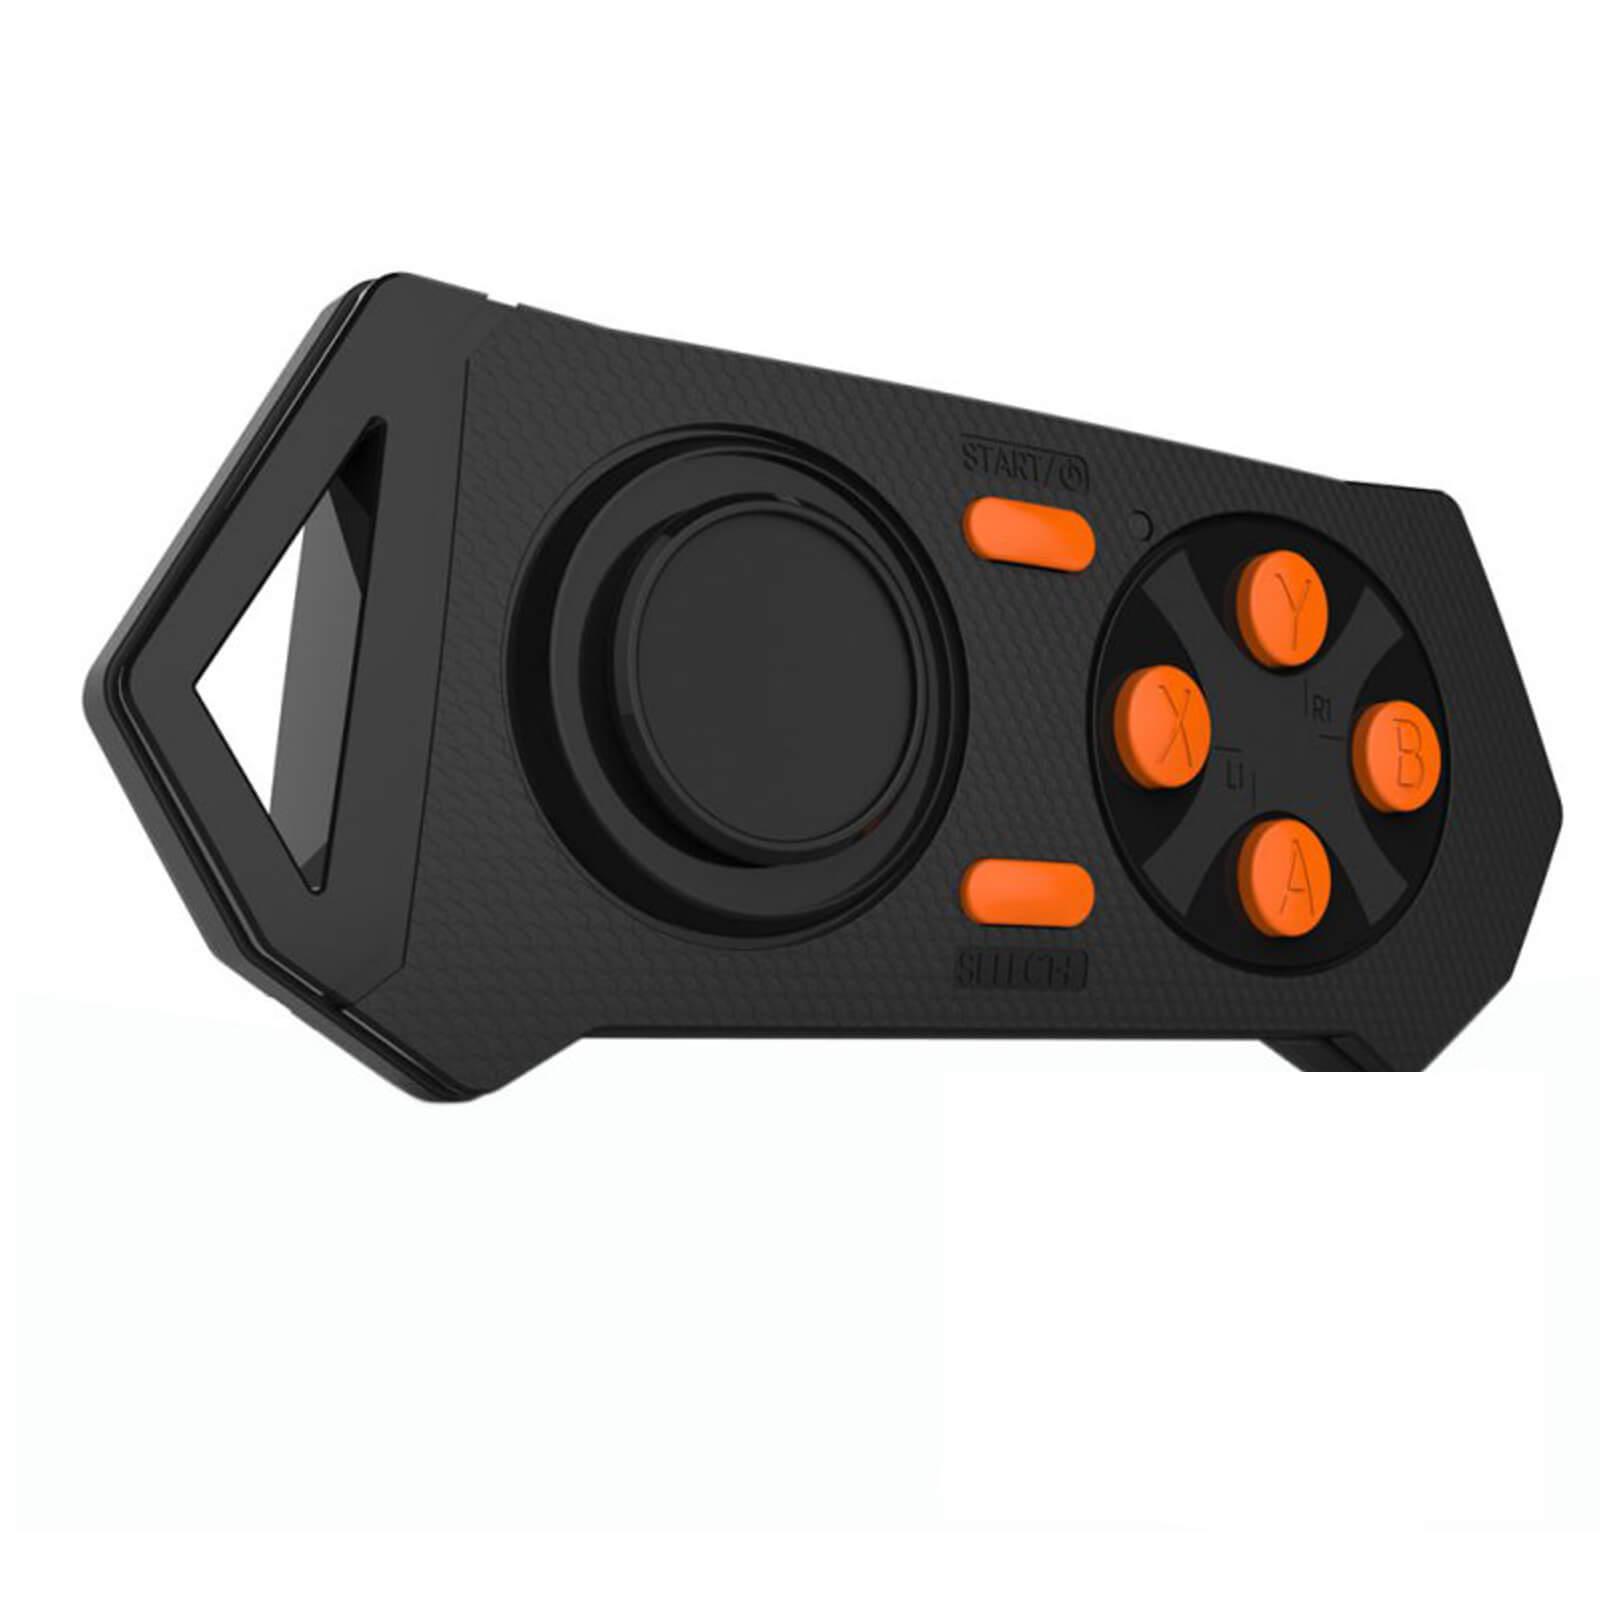 Smart Wireless Orange Gamepad Control Controller For Sony